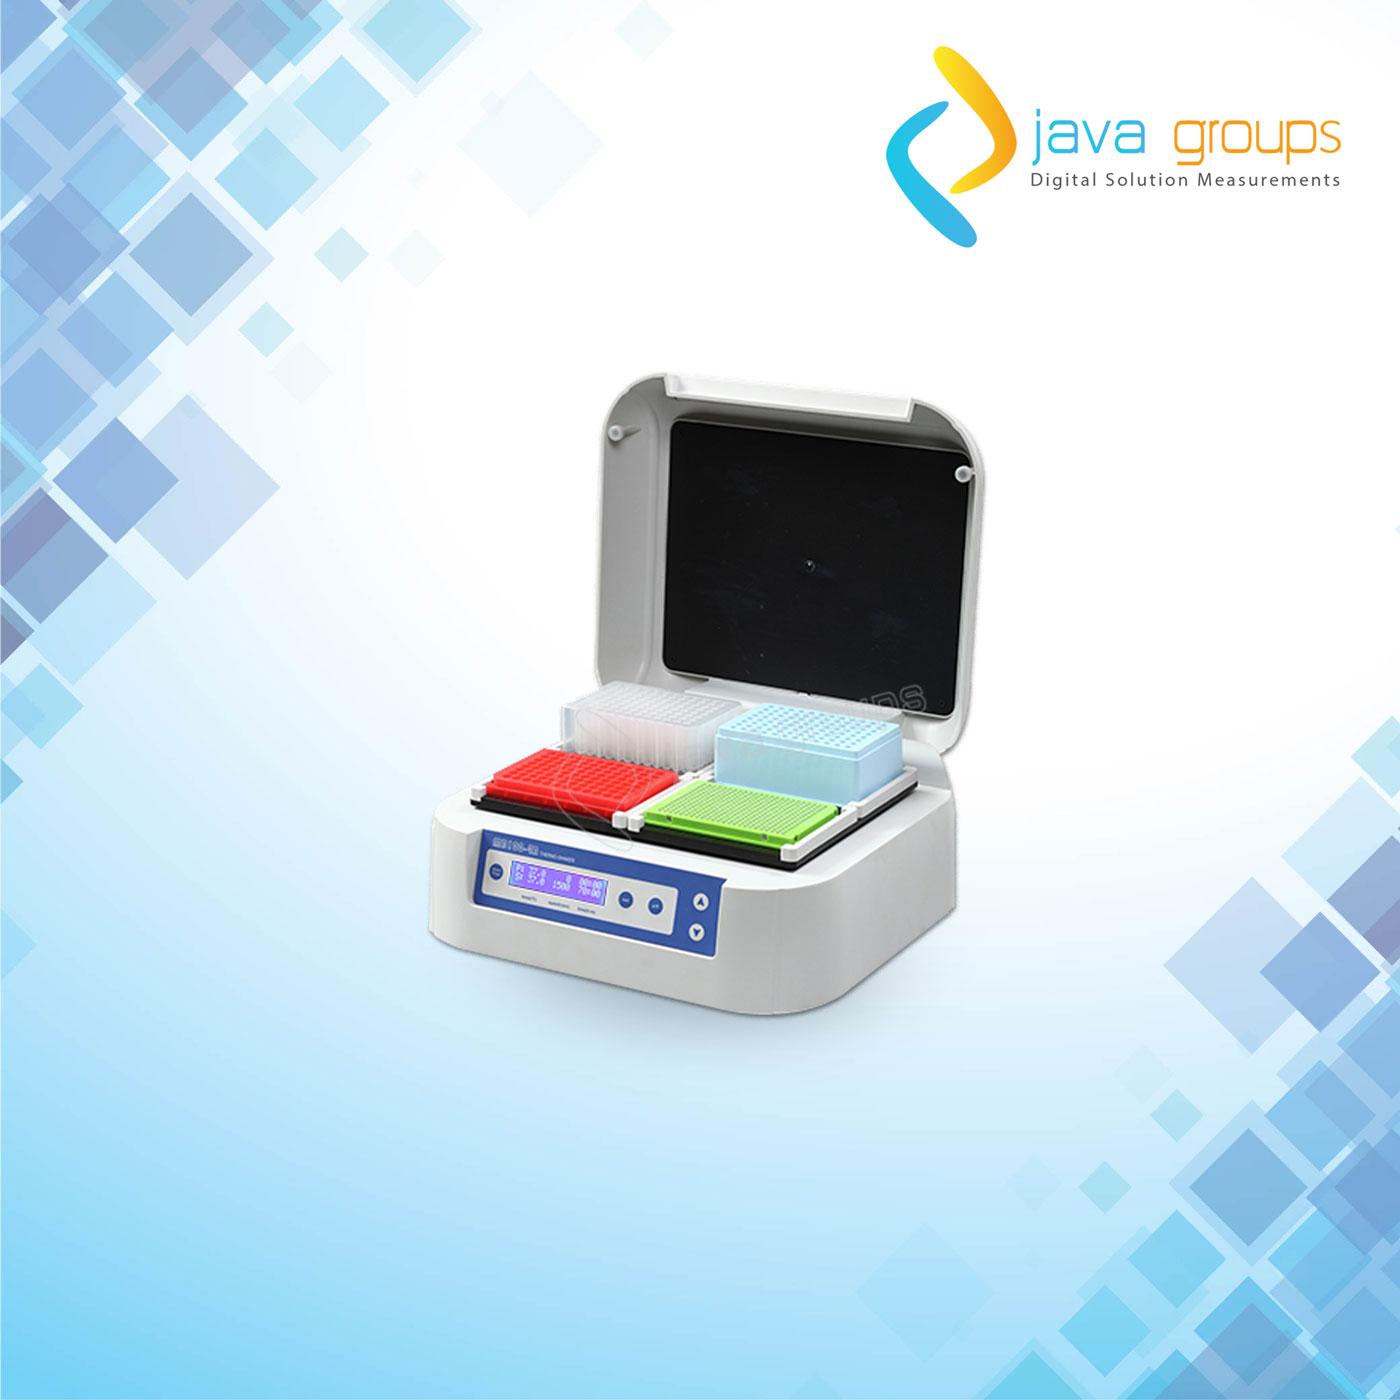 Alat Thermo Shaker Inkubator Seri MB100-4A / MK100-4A